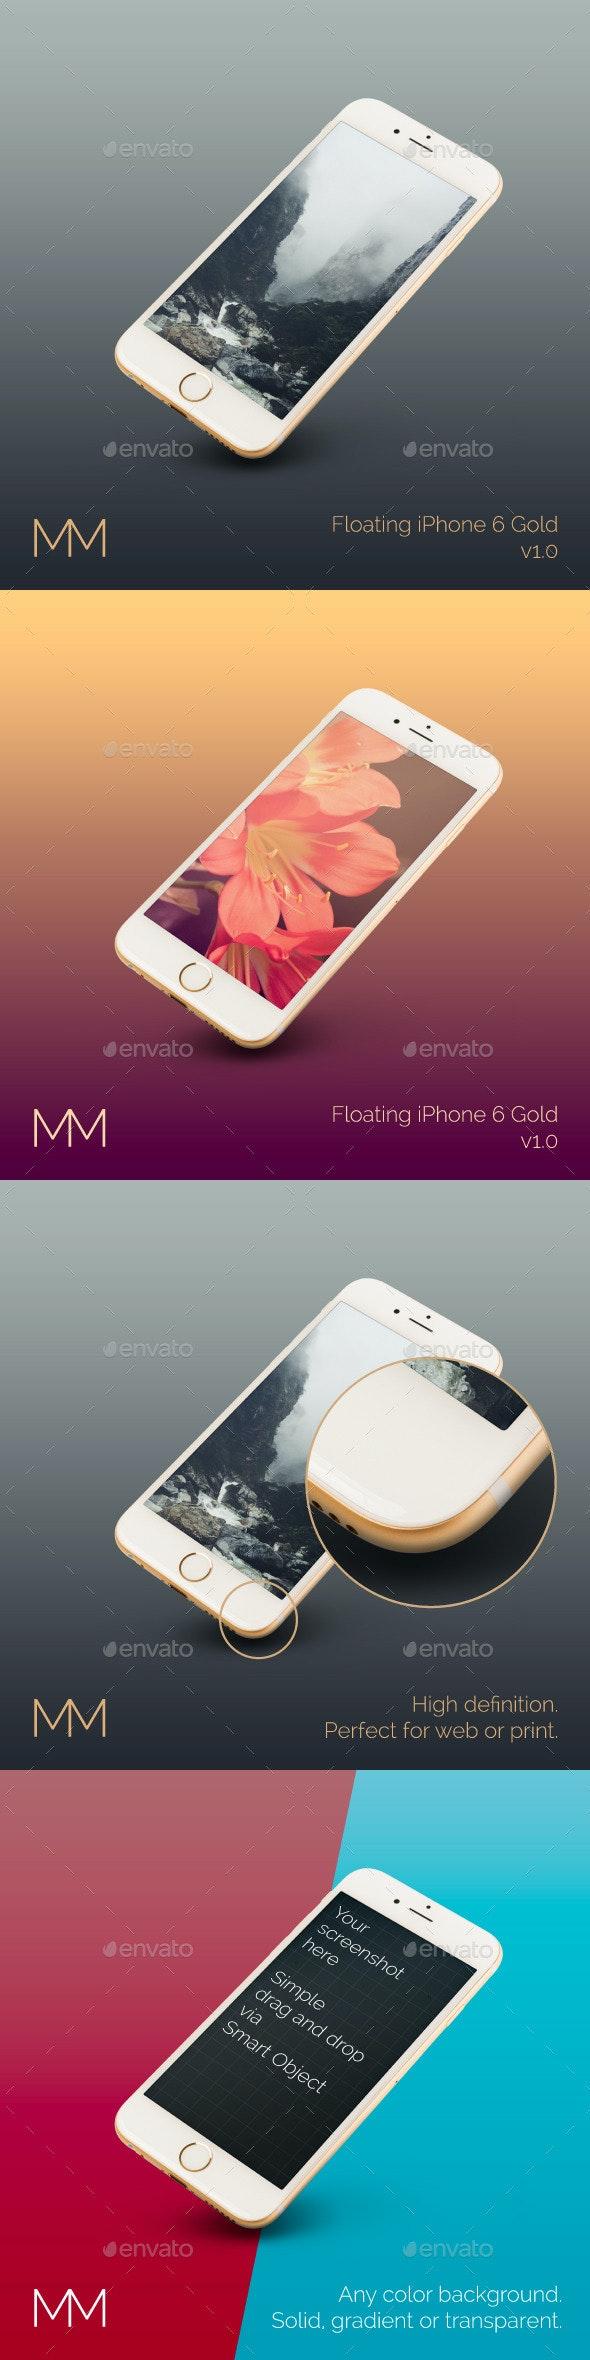 Floating iPhone 6 Gold MockUp - Product Mock-Ups Graphics